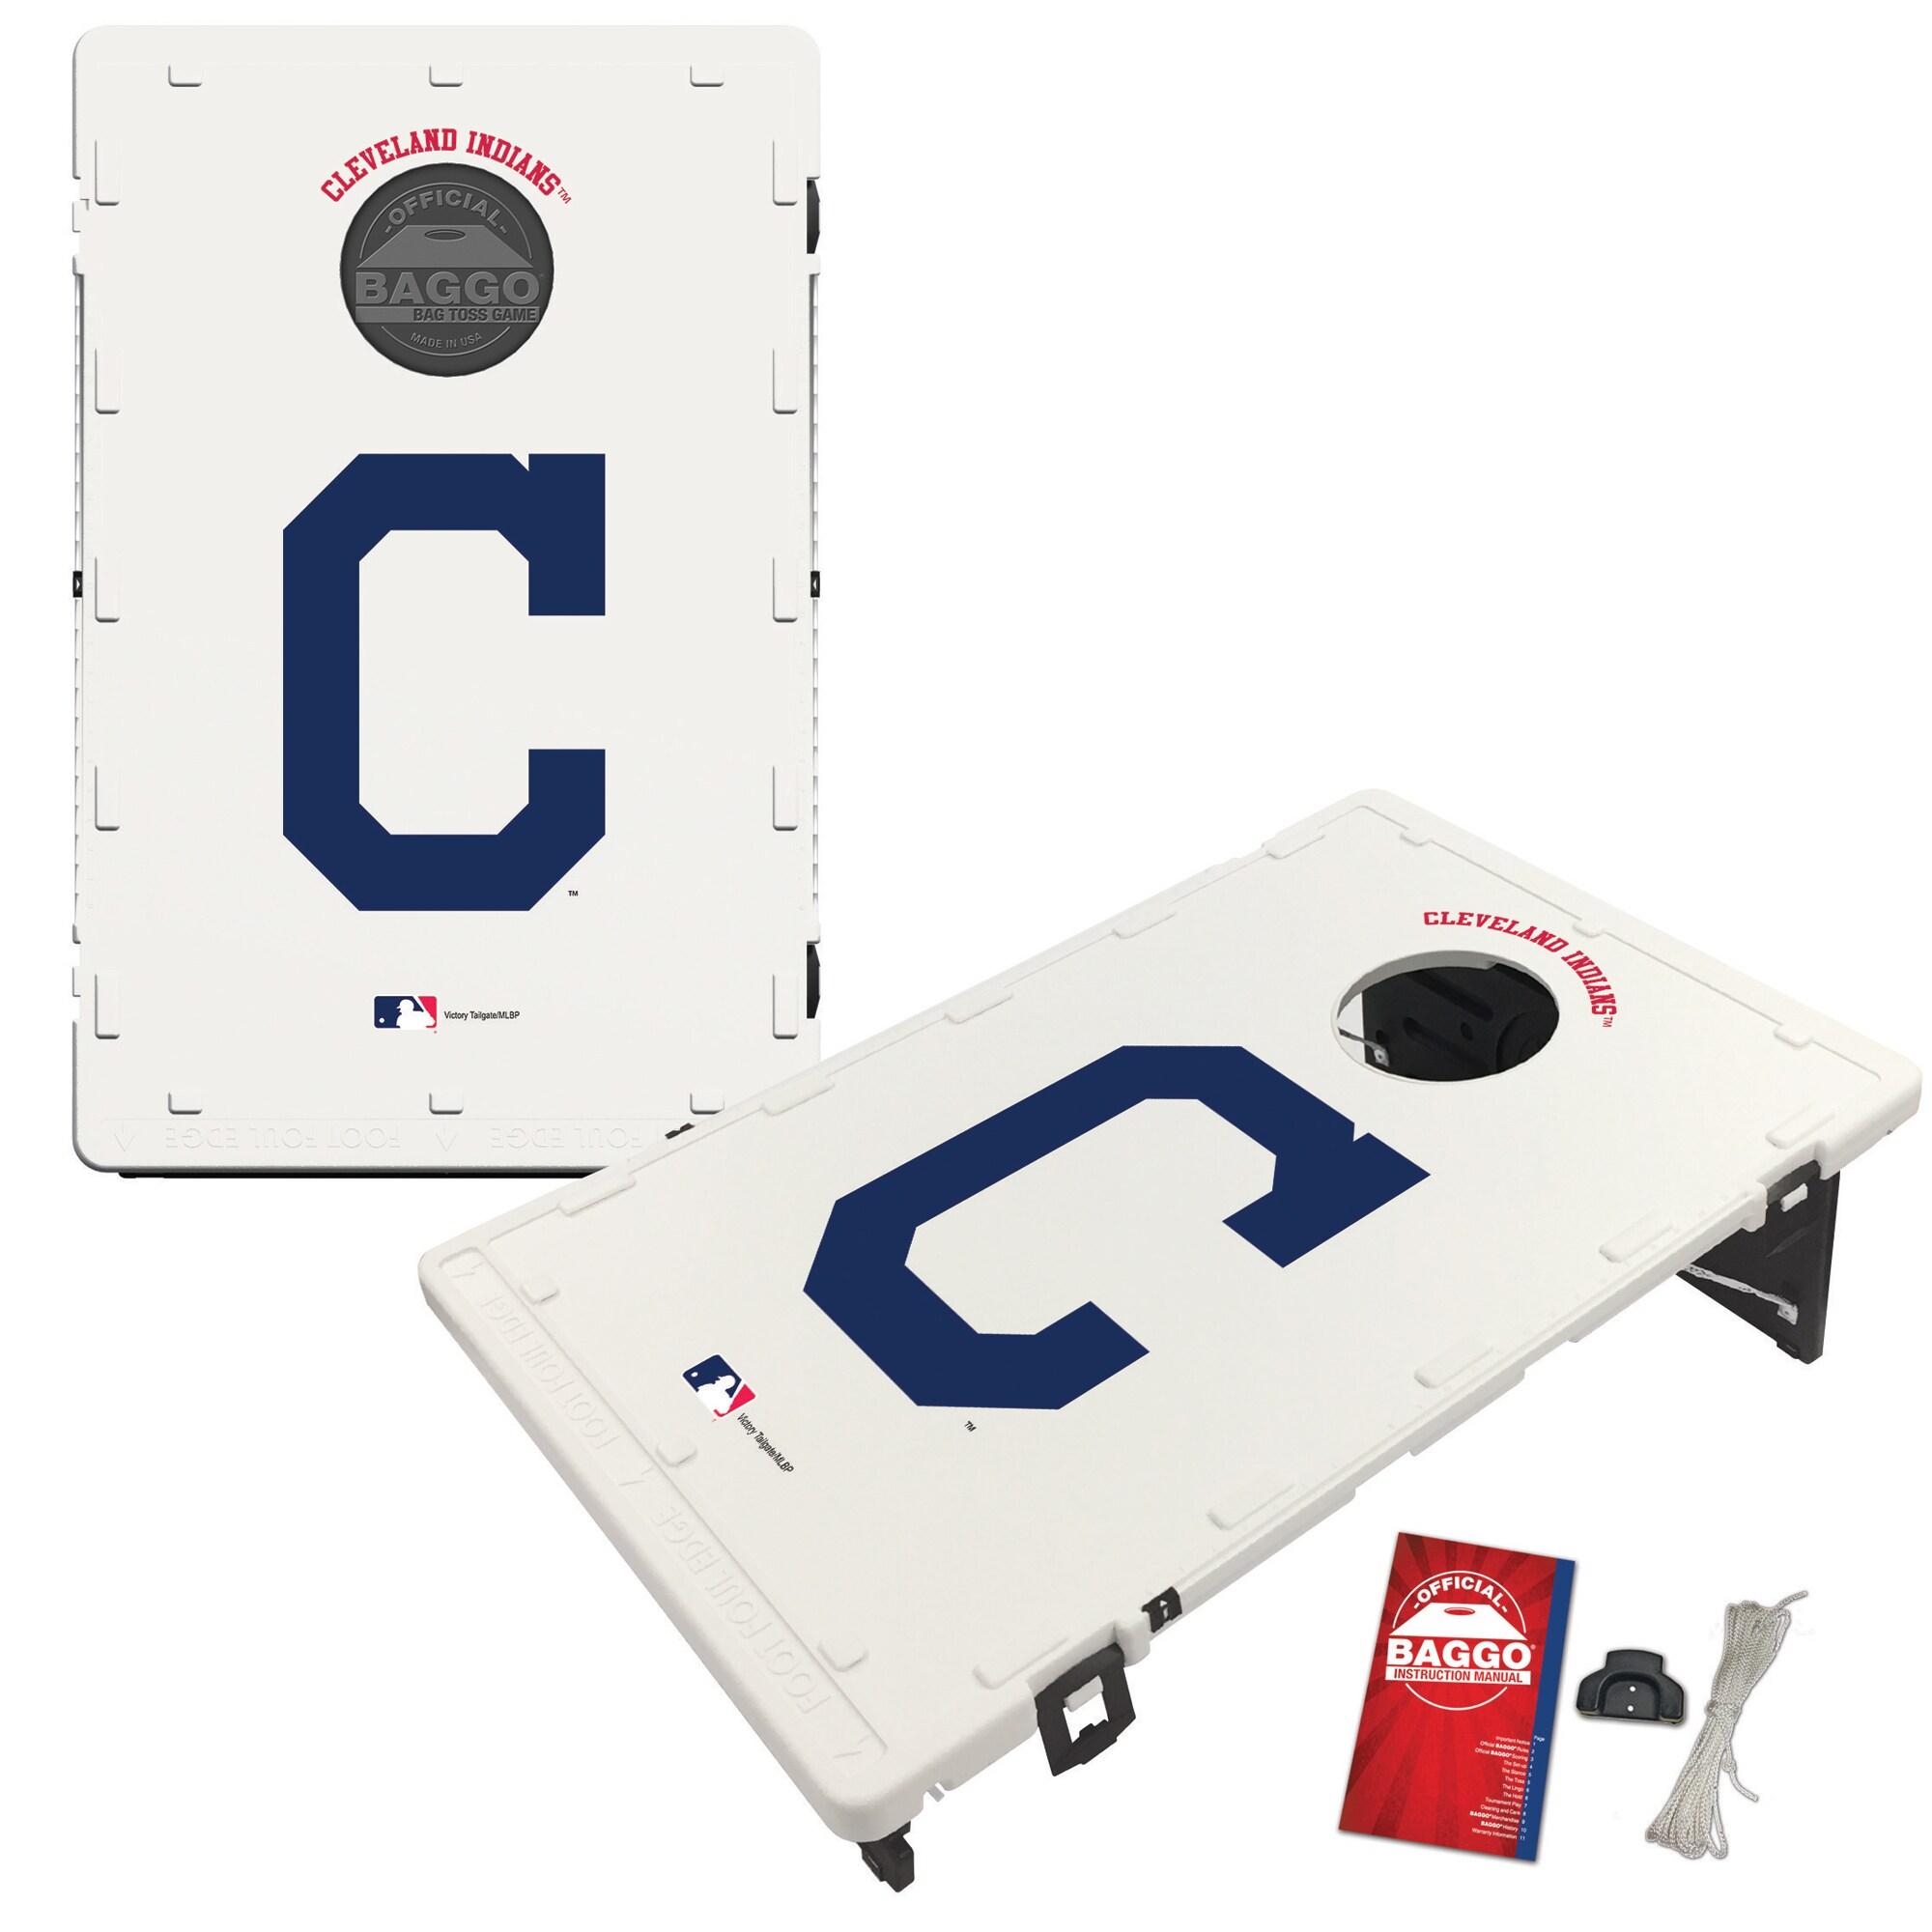 Cleveland Indians 2' x 3' BAGGO Classic Cornhole Board Tailgate Toss Set